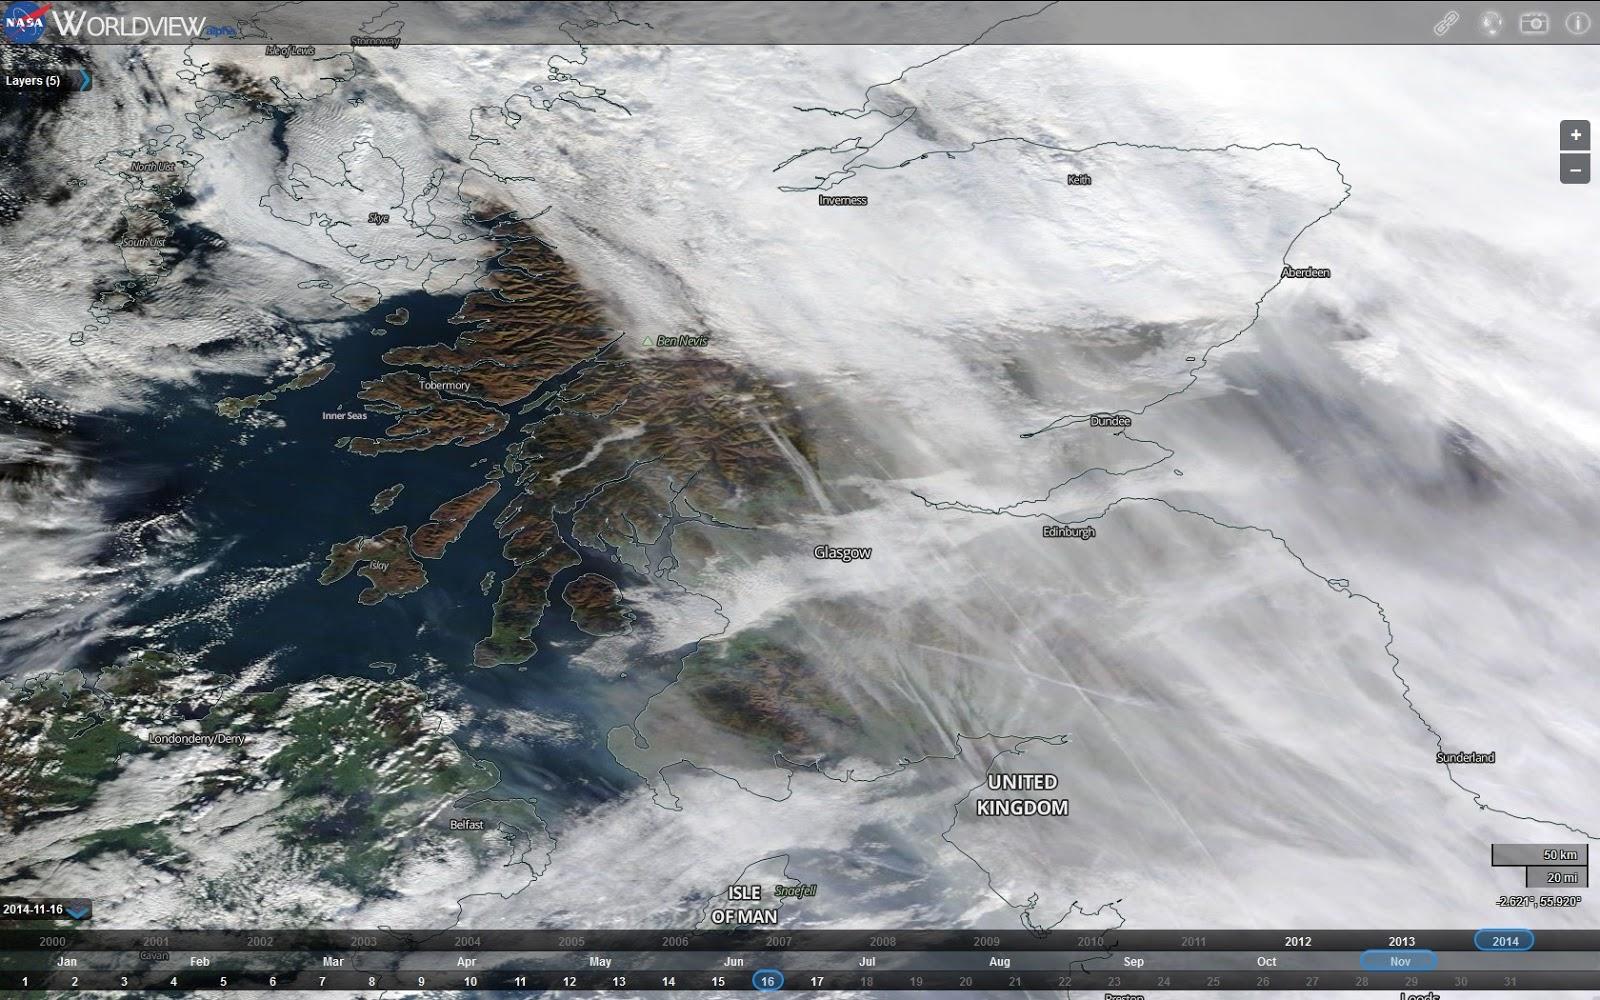 Scottish Chemtrails: NASA Worldview